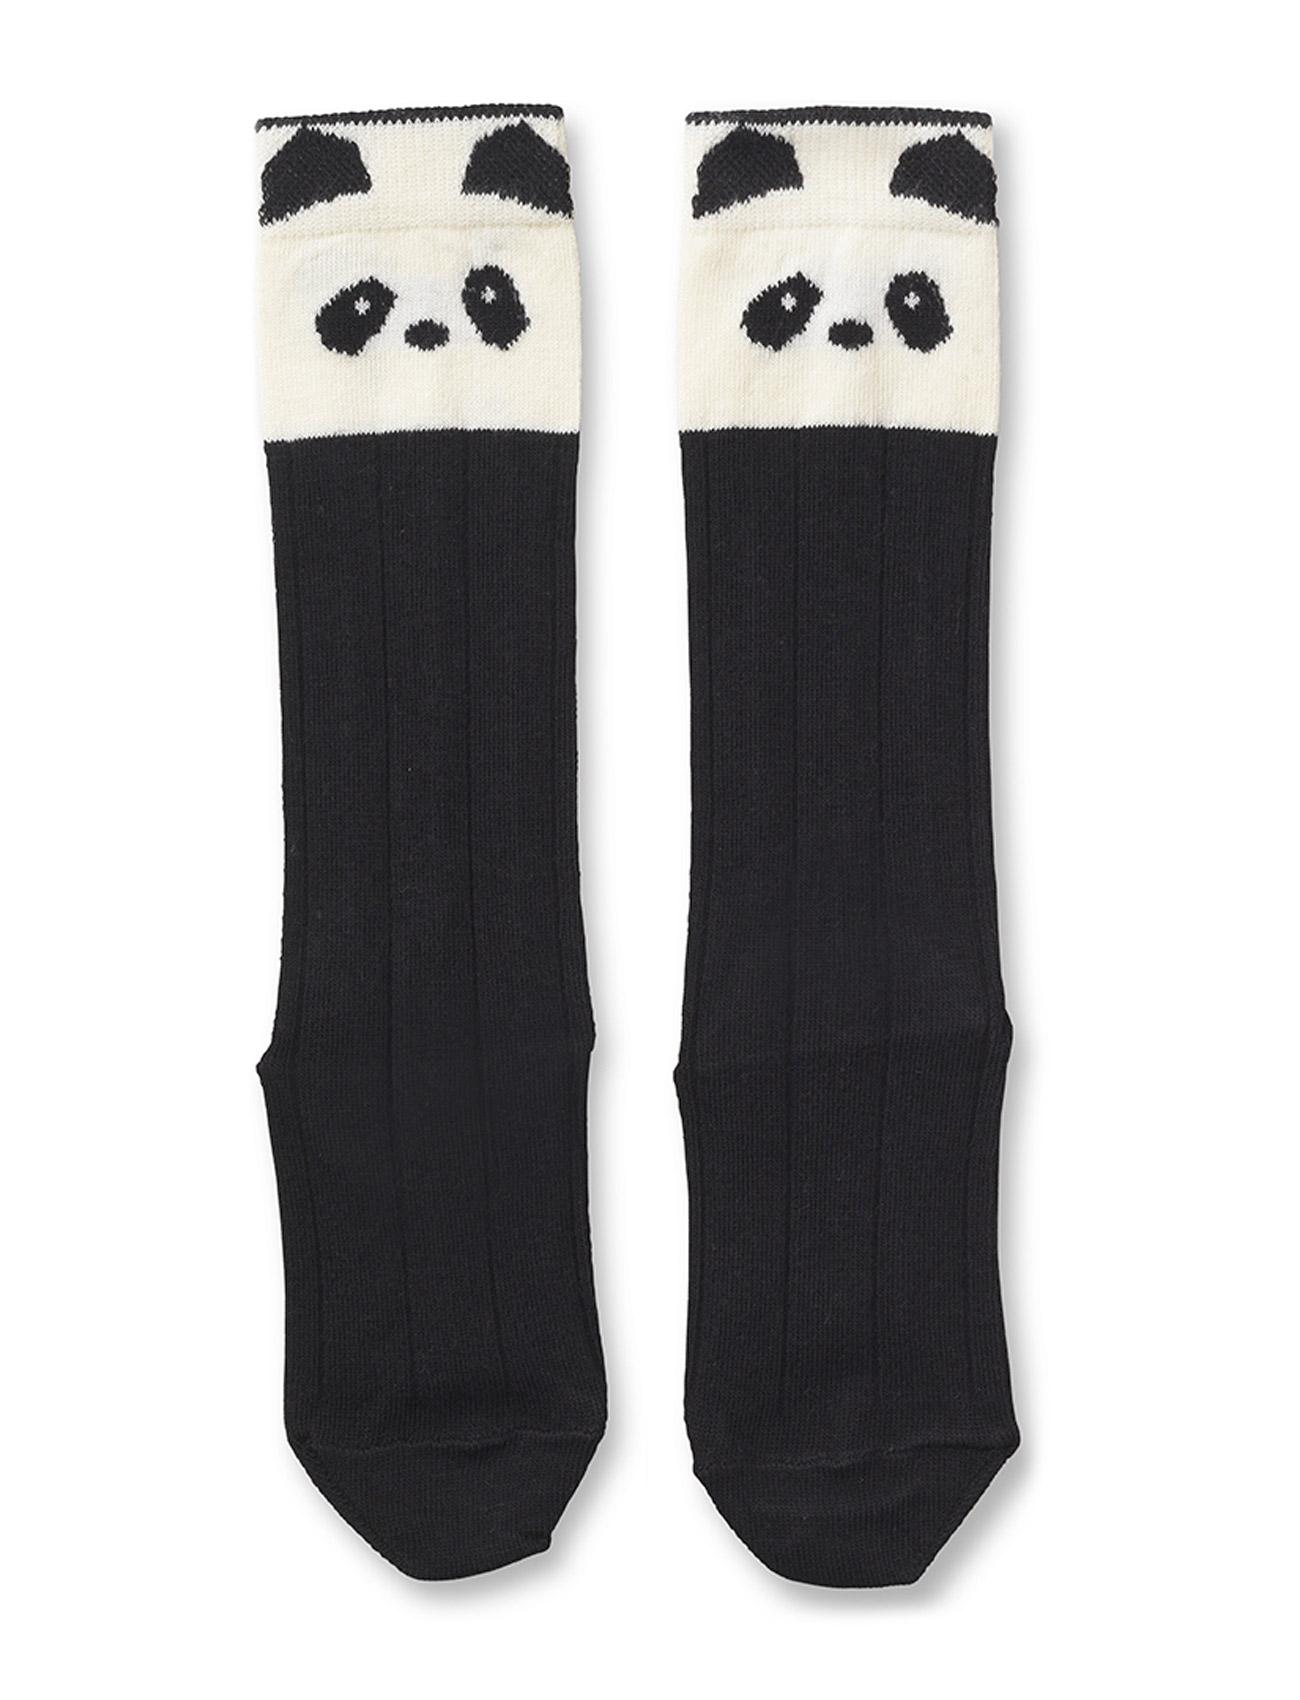 Liewood Sofia cotton knee socks - PANDA CREME DE LA CREME